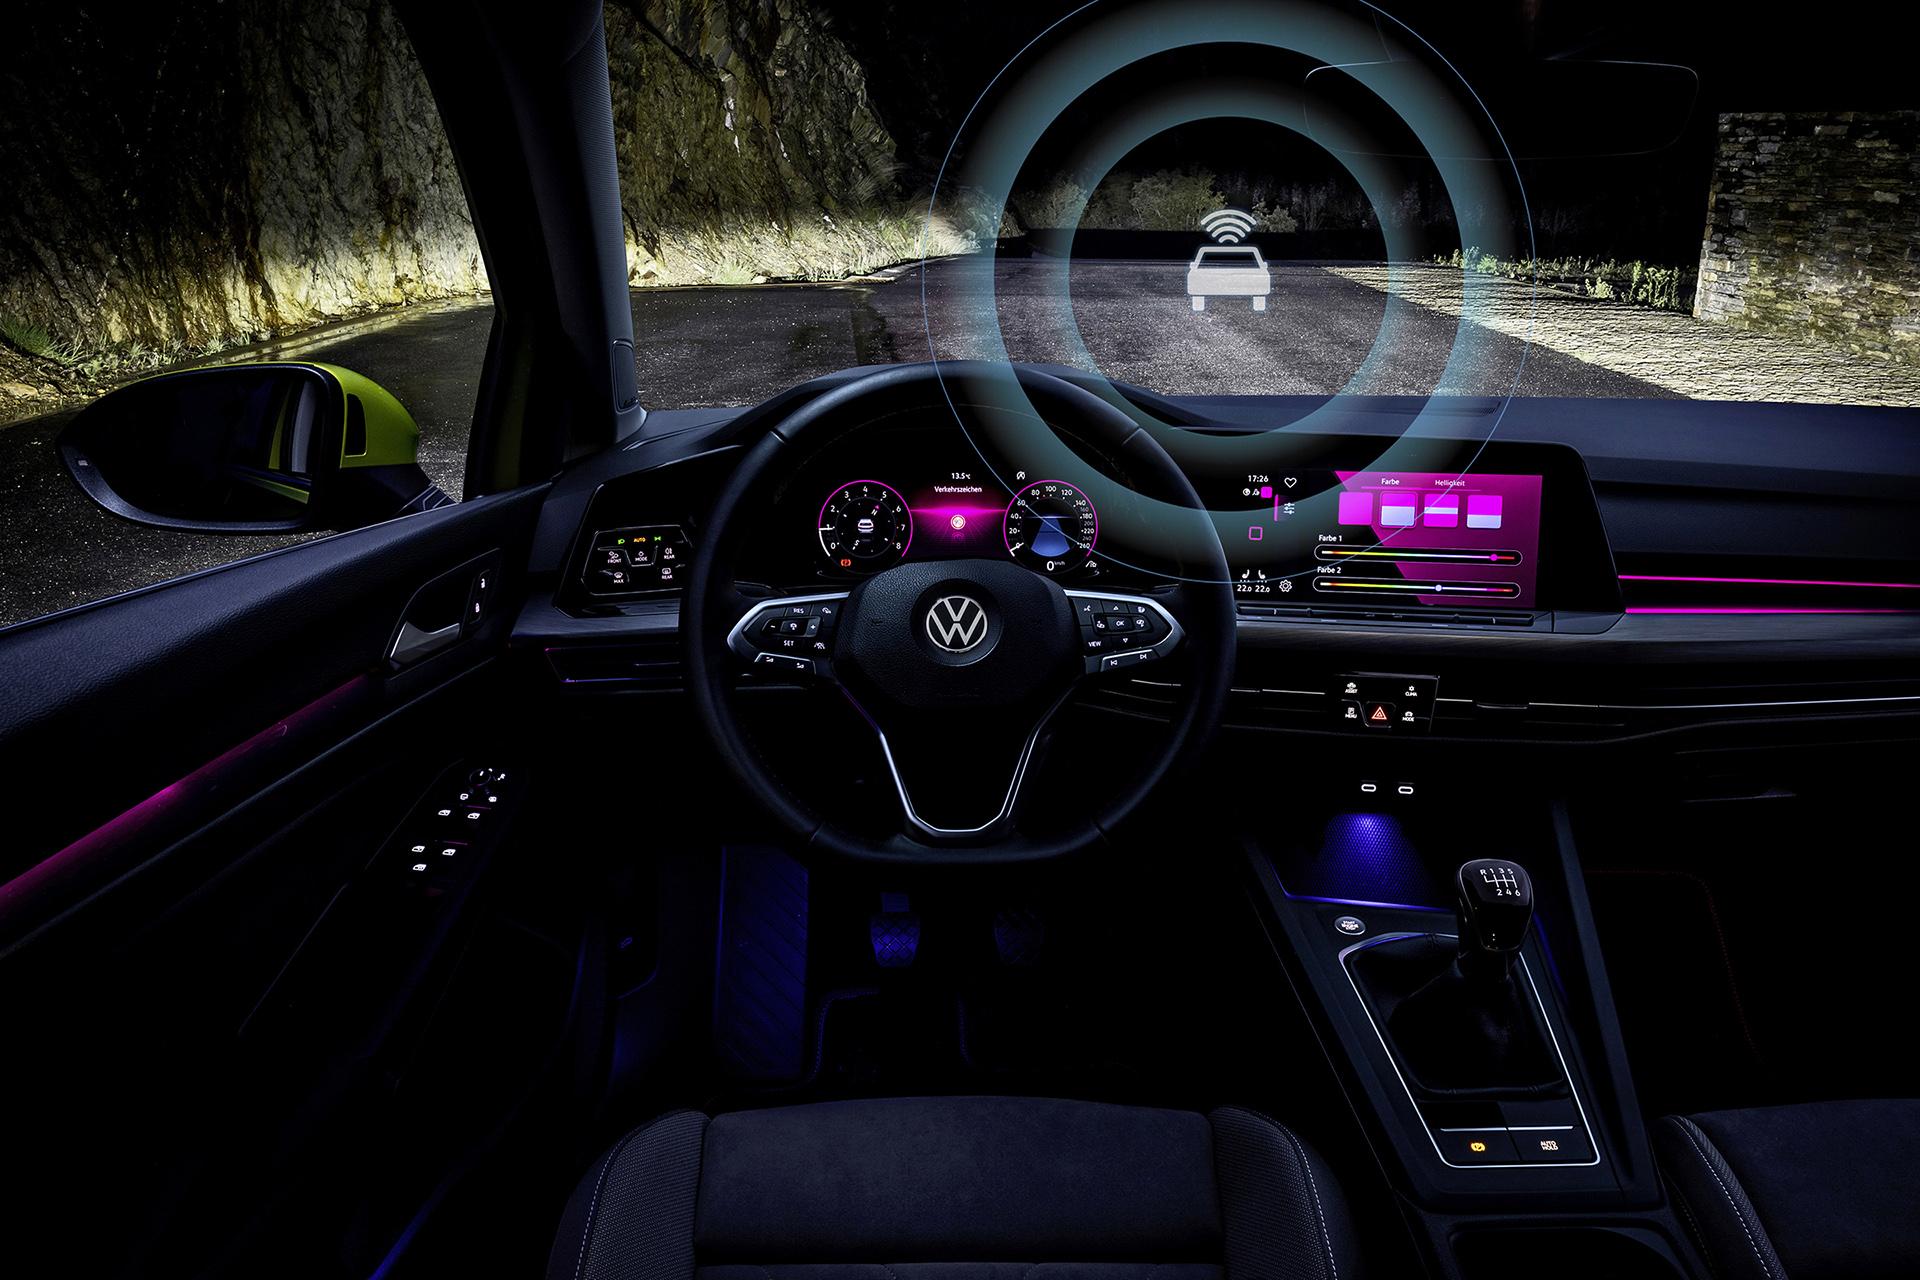 "VOLKSWAGEN INNOVATION TALK PROJECT HOUSE 4 Η Volkswagen μας αφήνει να ρίξουμε μια ""ματιά"" στο μέλλον της αυτοκίνησης Electric cars, electric vehicles, ID.3, ID.4, ID.4 GTX, Volkswagen, Volkswagen Group, Volkswagen ID.3, Volkswagen ID.4, Volkswagen ID.4 GTX, VW, VW ID.3, zblog, ειδήσεις, ηλεκτρικά, ηλεκτροκινηση, κινουμαι ηλεκτρικα, Νέα"